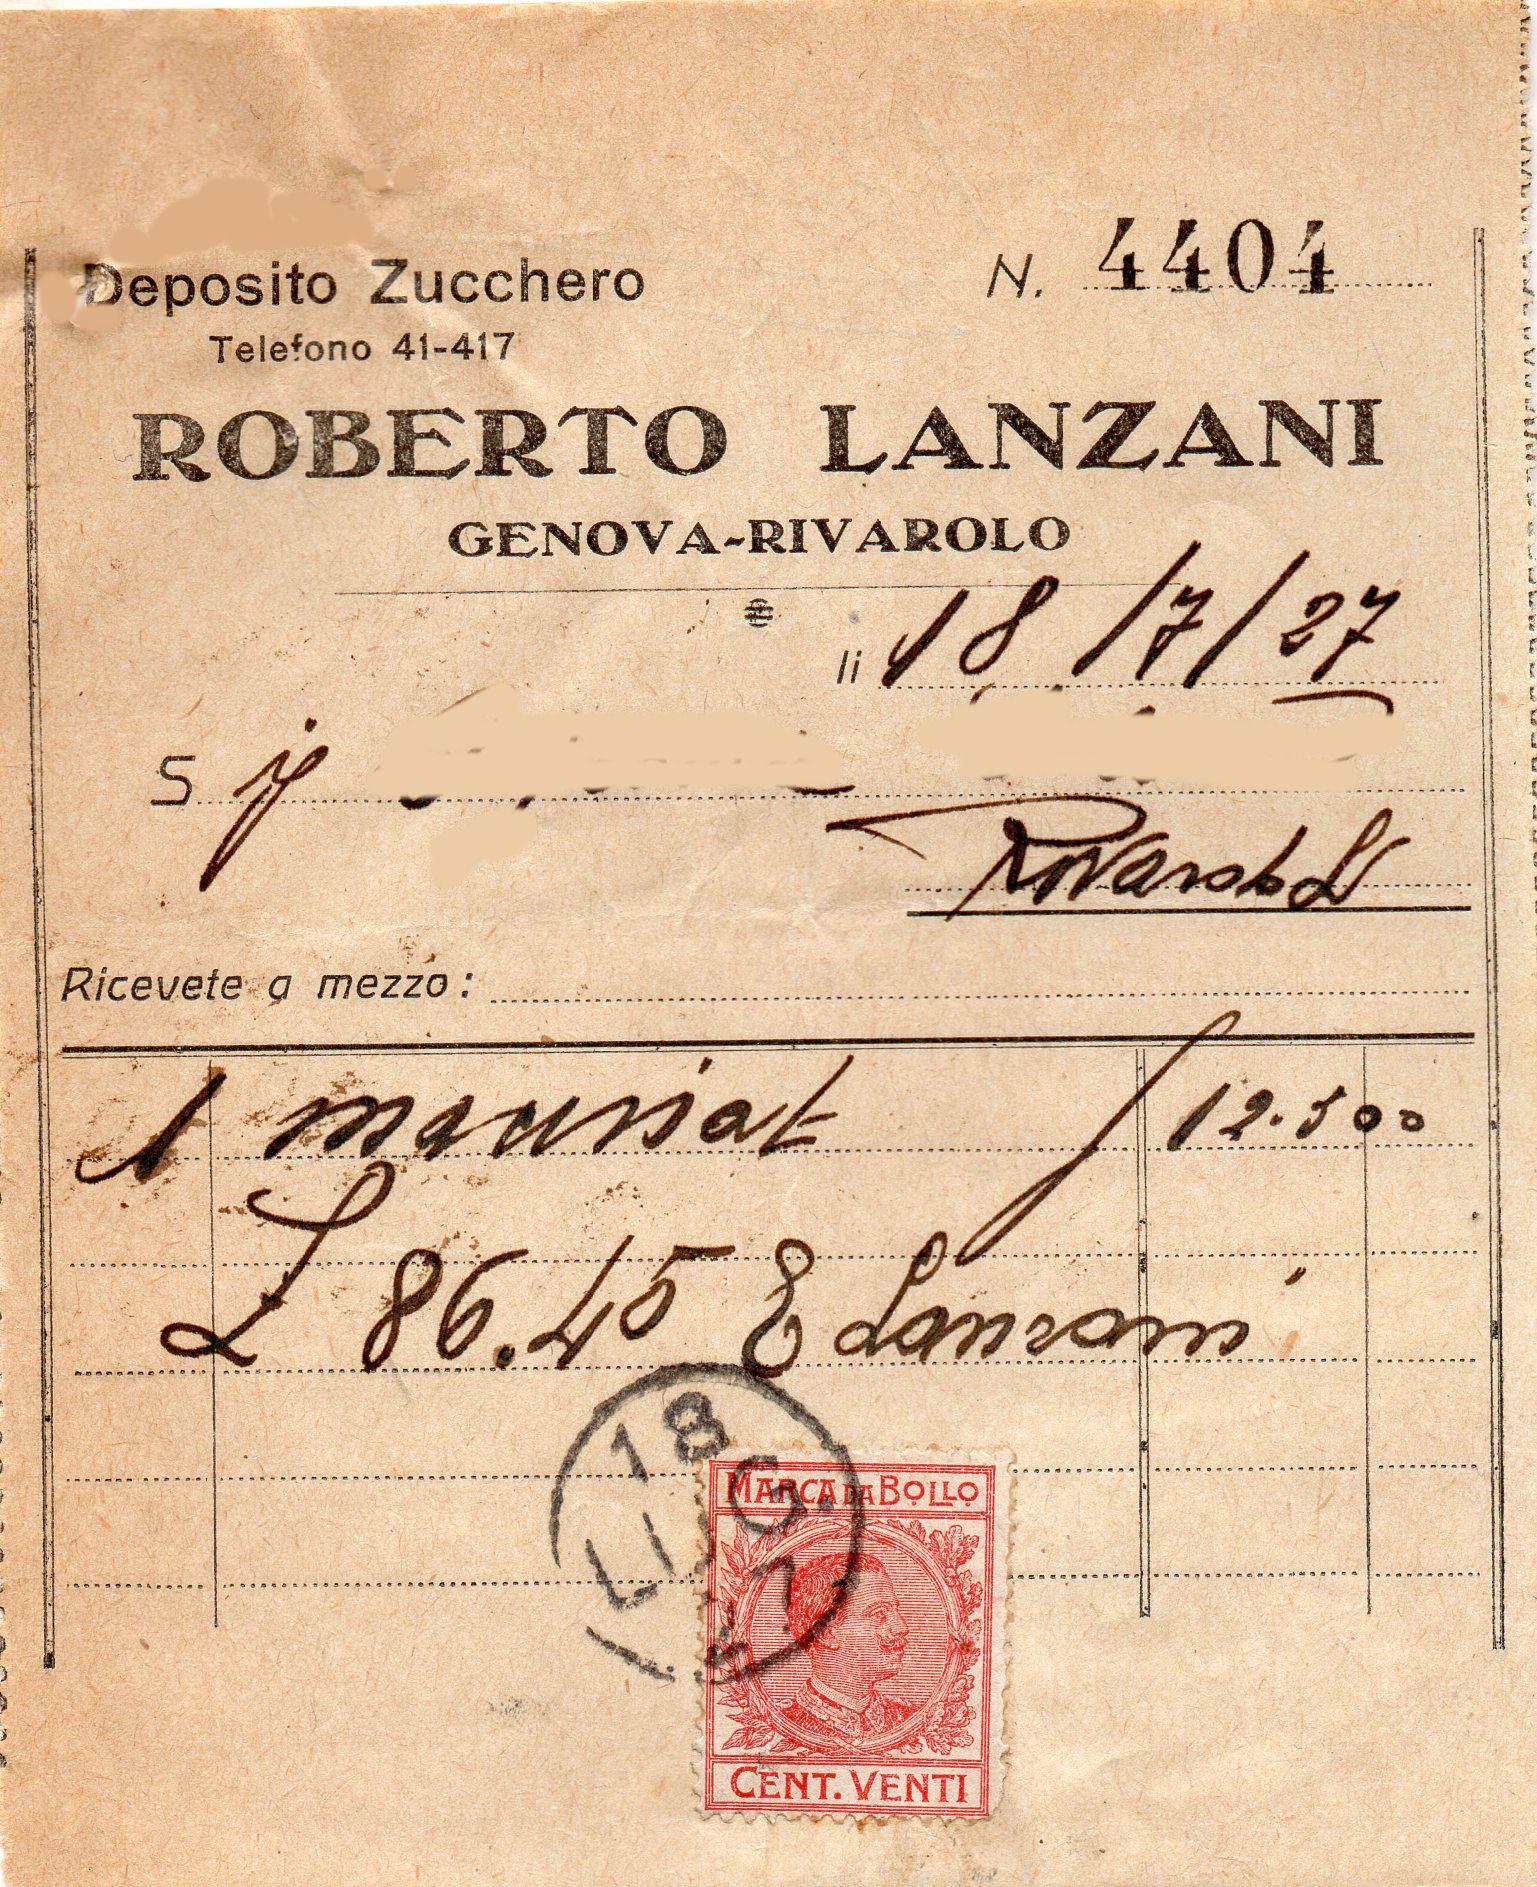 Roberto Lanzani deposito zucchero Genova Rivarolo